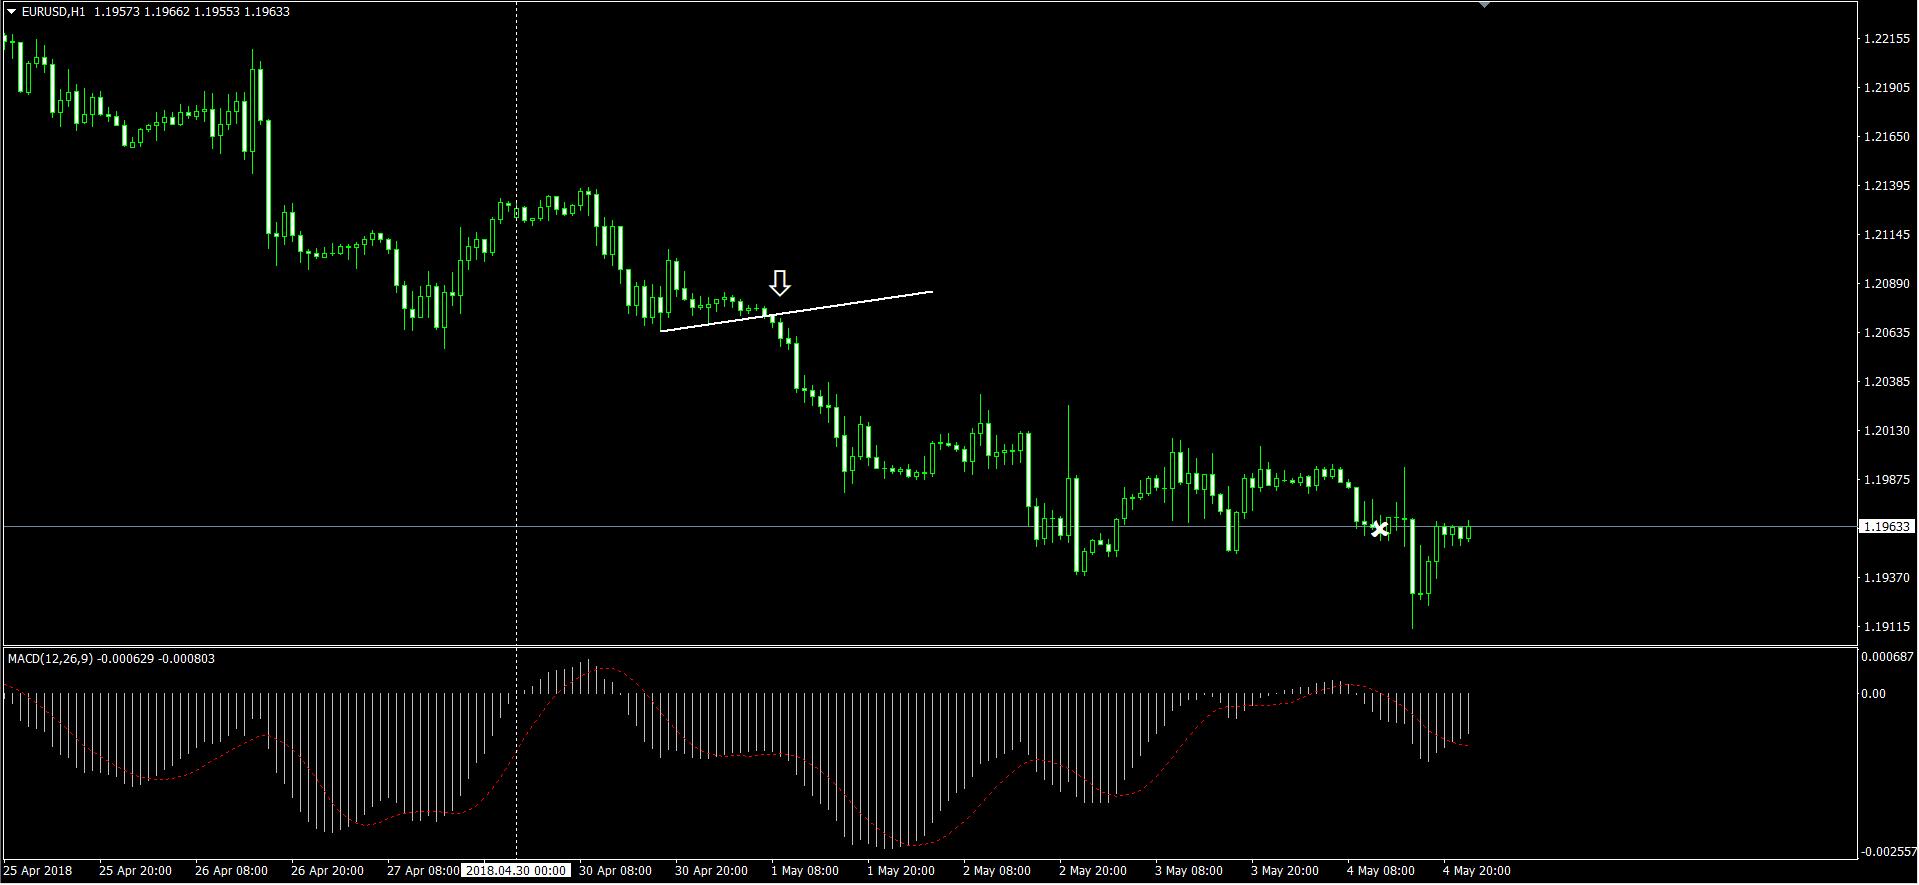 EURUSDの H1 チャート画面